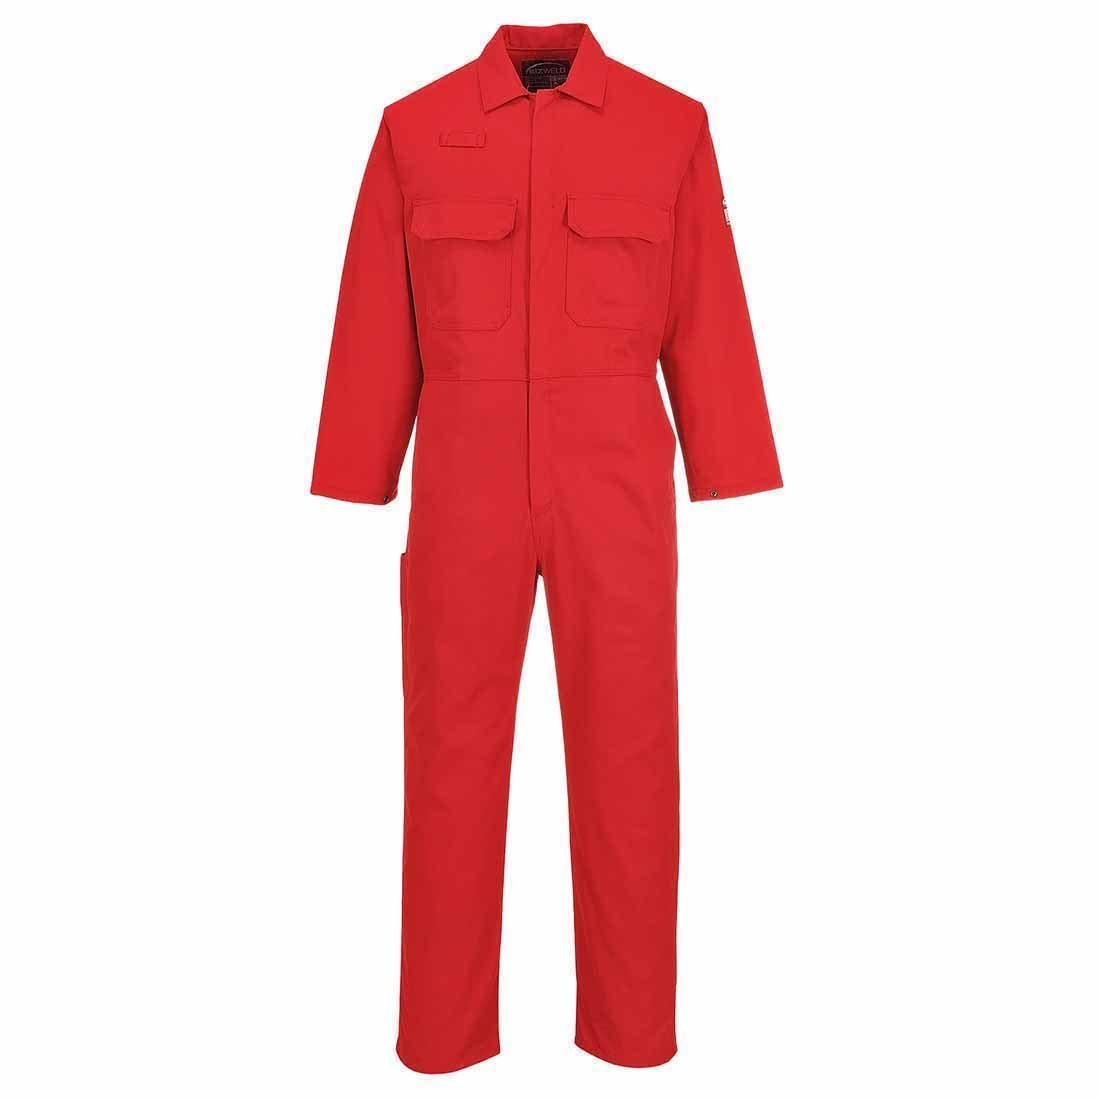 BizWeld boilersuit talla Medium color rojo Portwest BIZ1